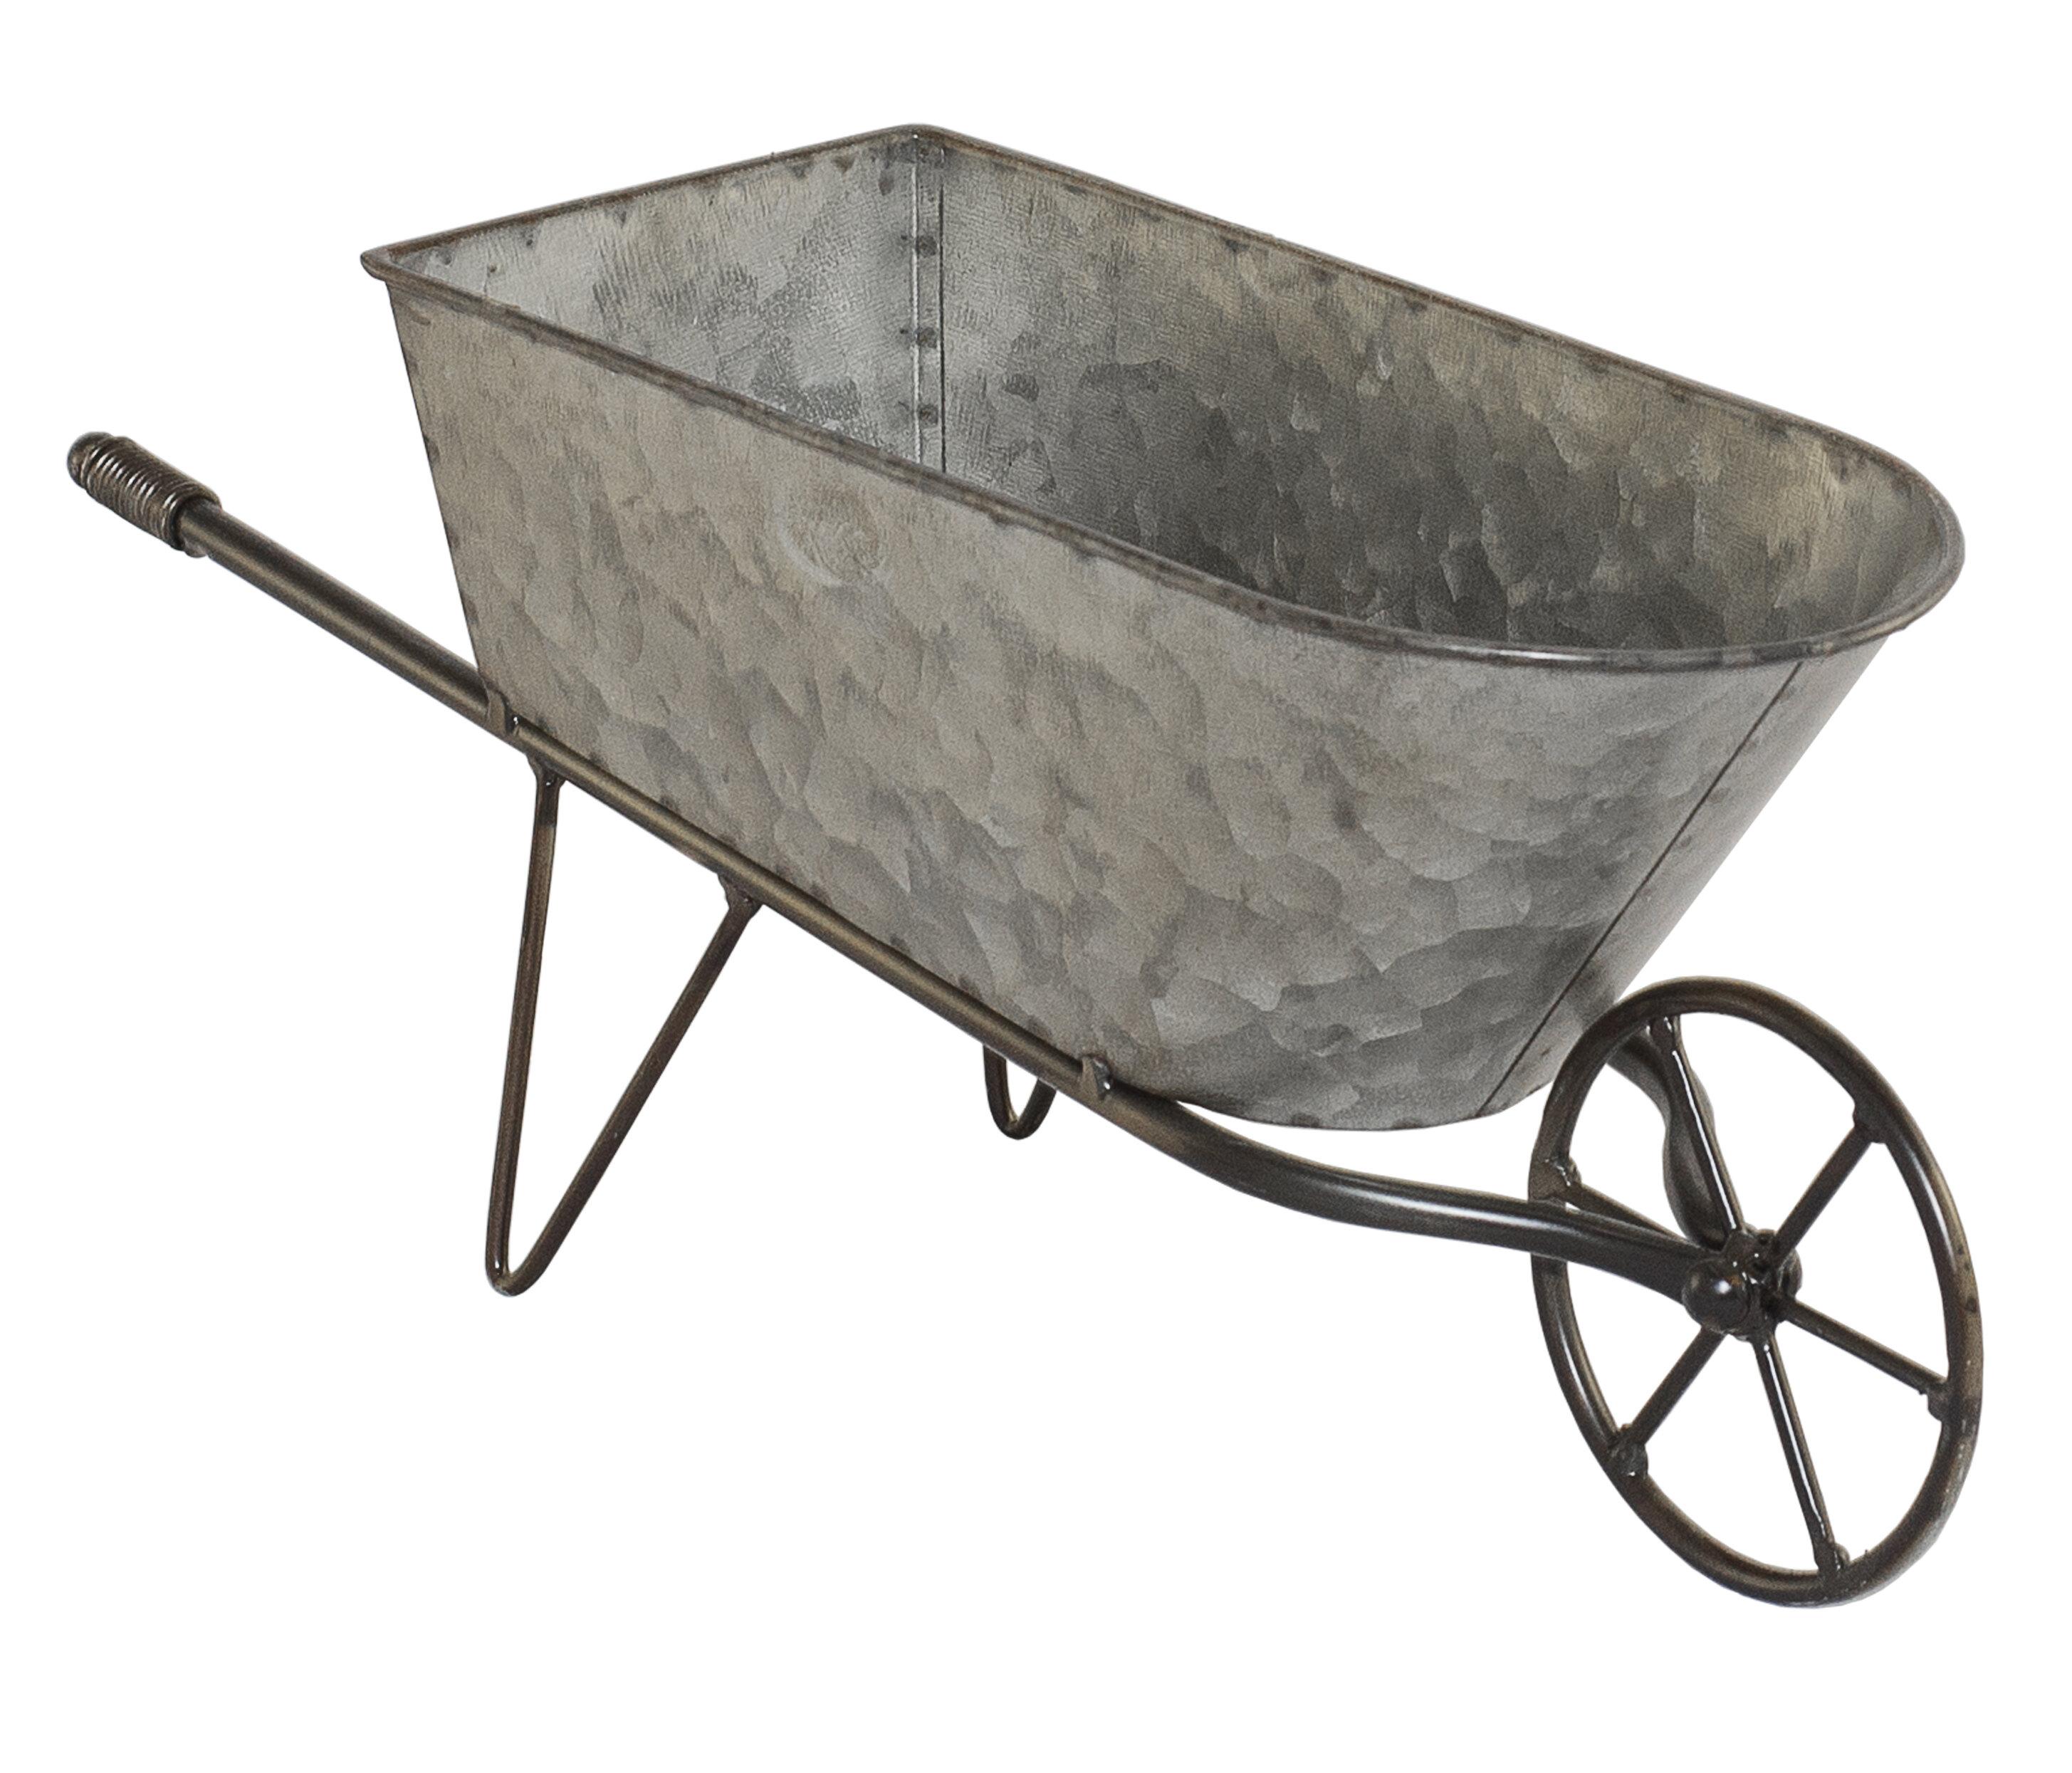 Humboldt Galvanized Metal Wheelbarrow Planter